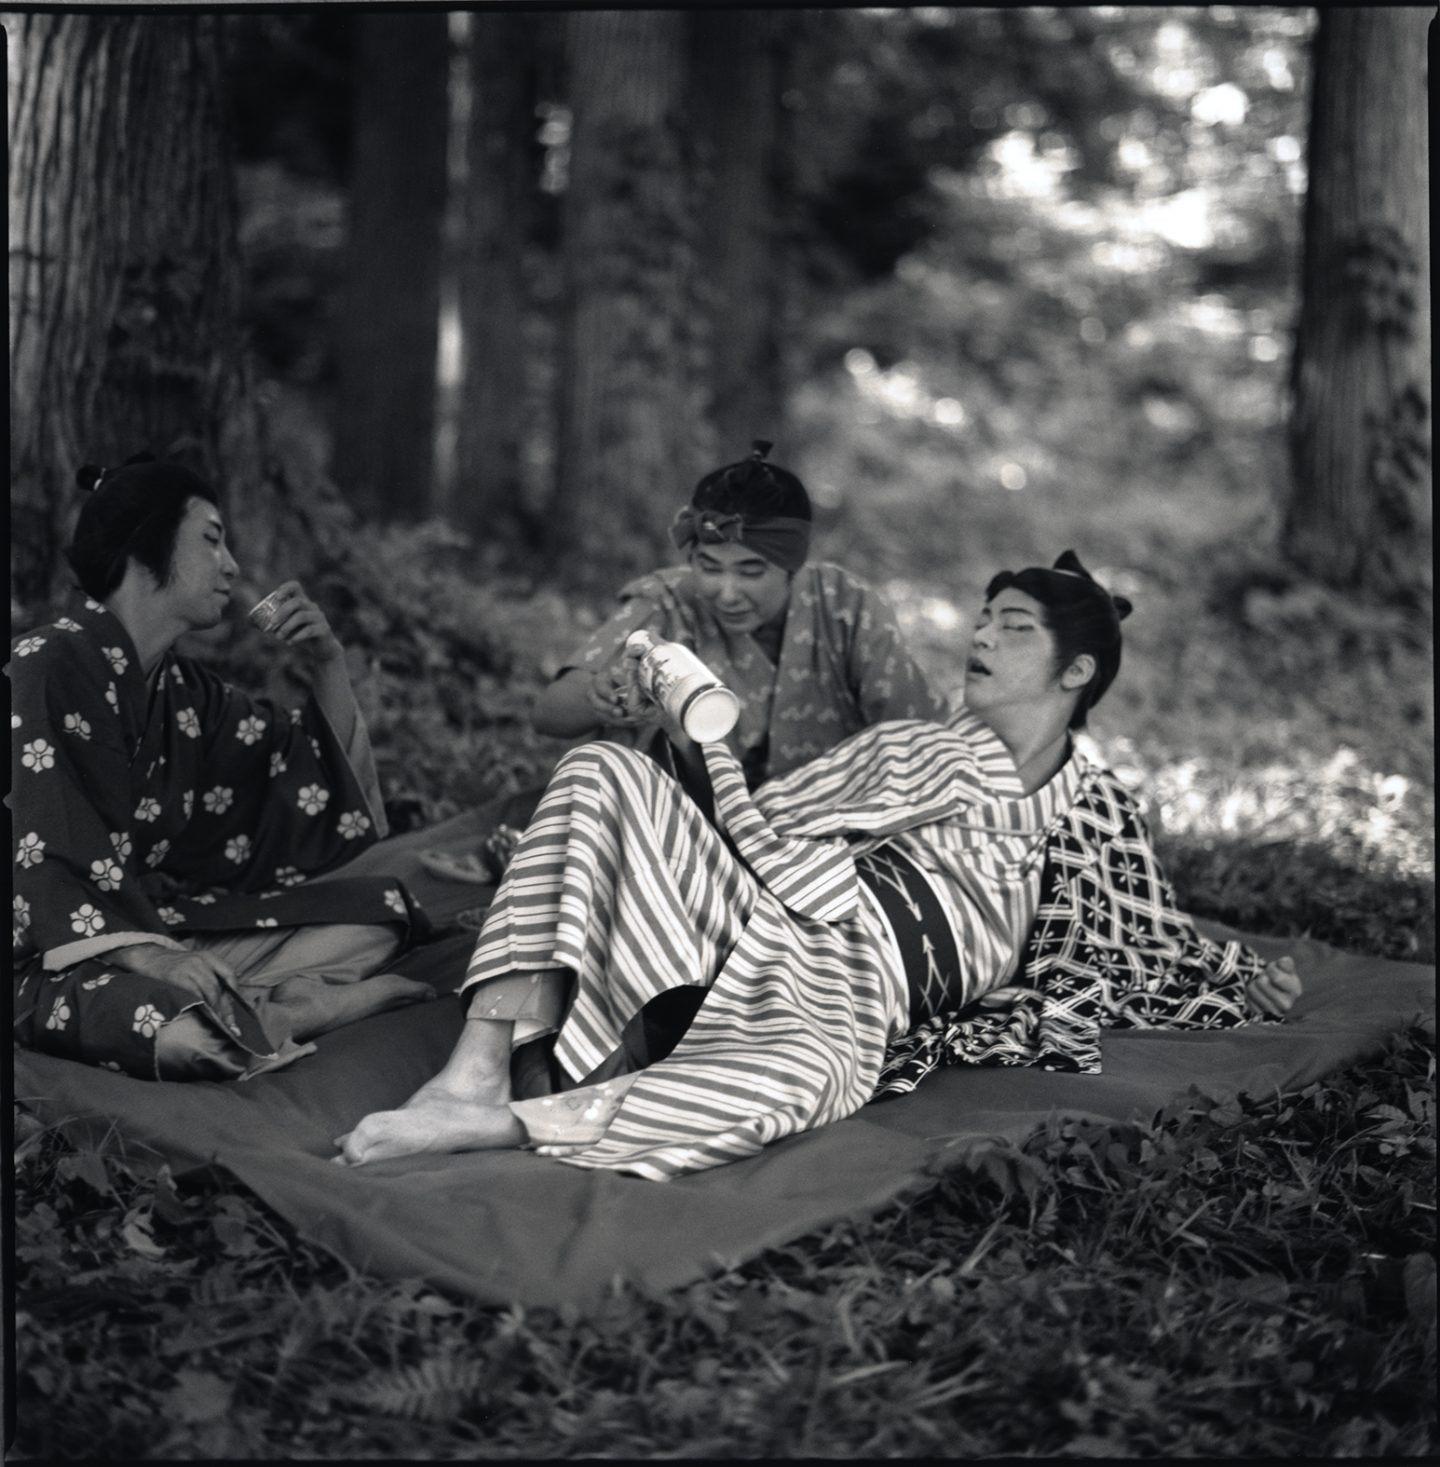 IGNANT-Photography-Hiroshi-Watanabe-Kwaidan-01